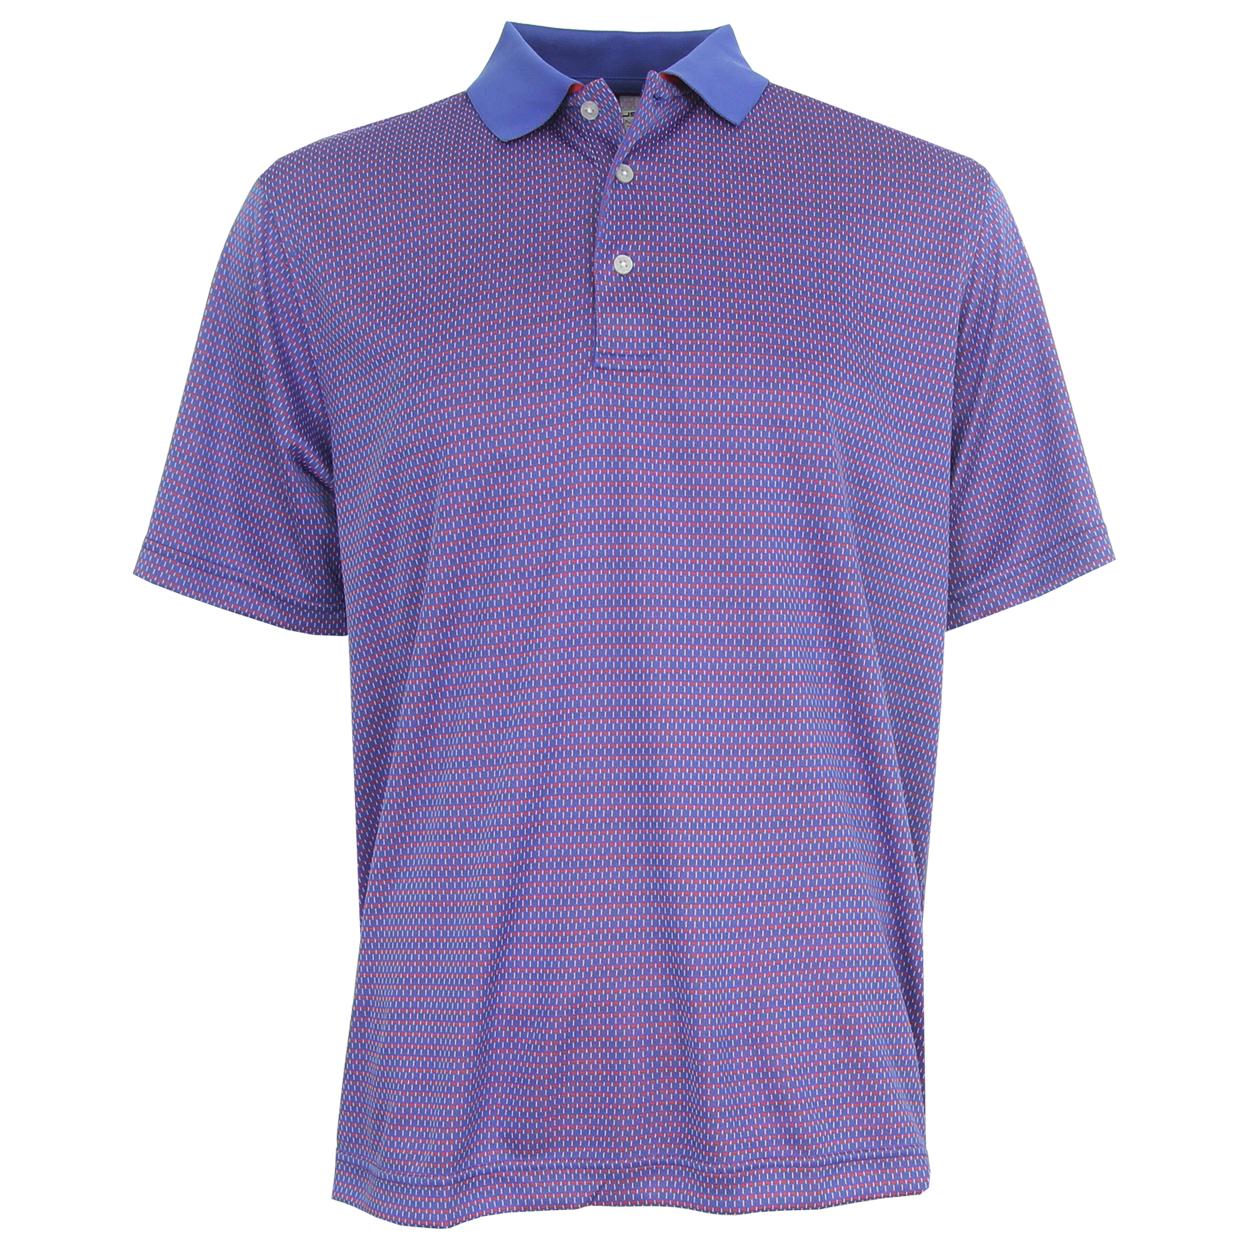 Carnoustie performance jacquard knit polo golf shirt for Polo brand polo shirts